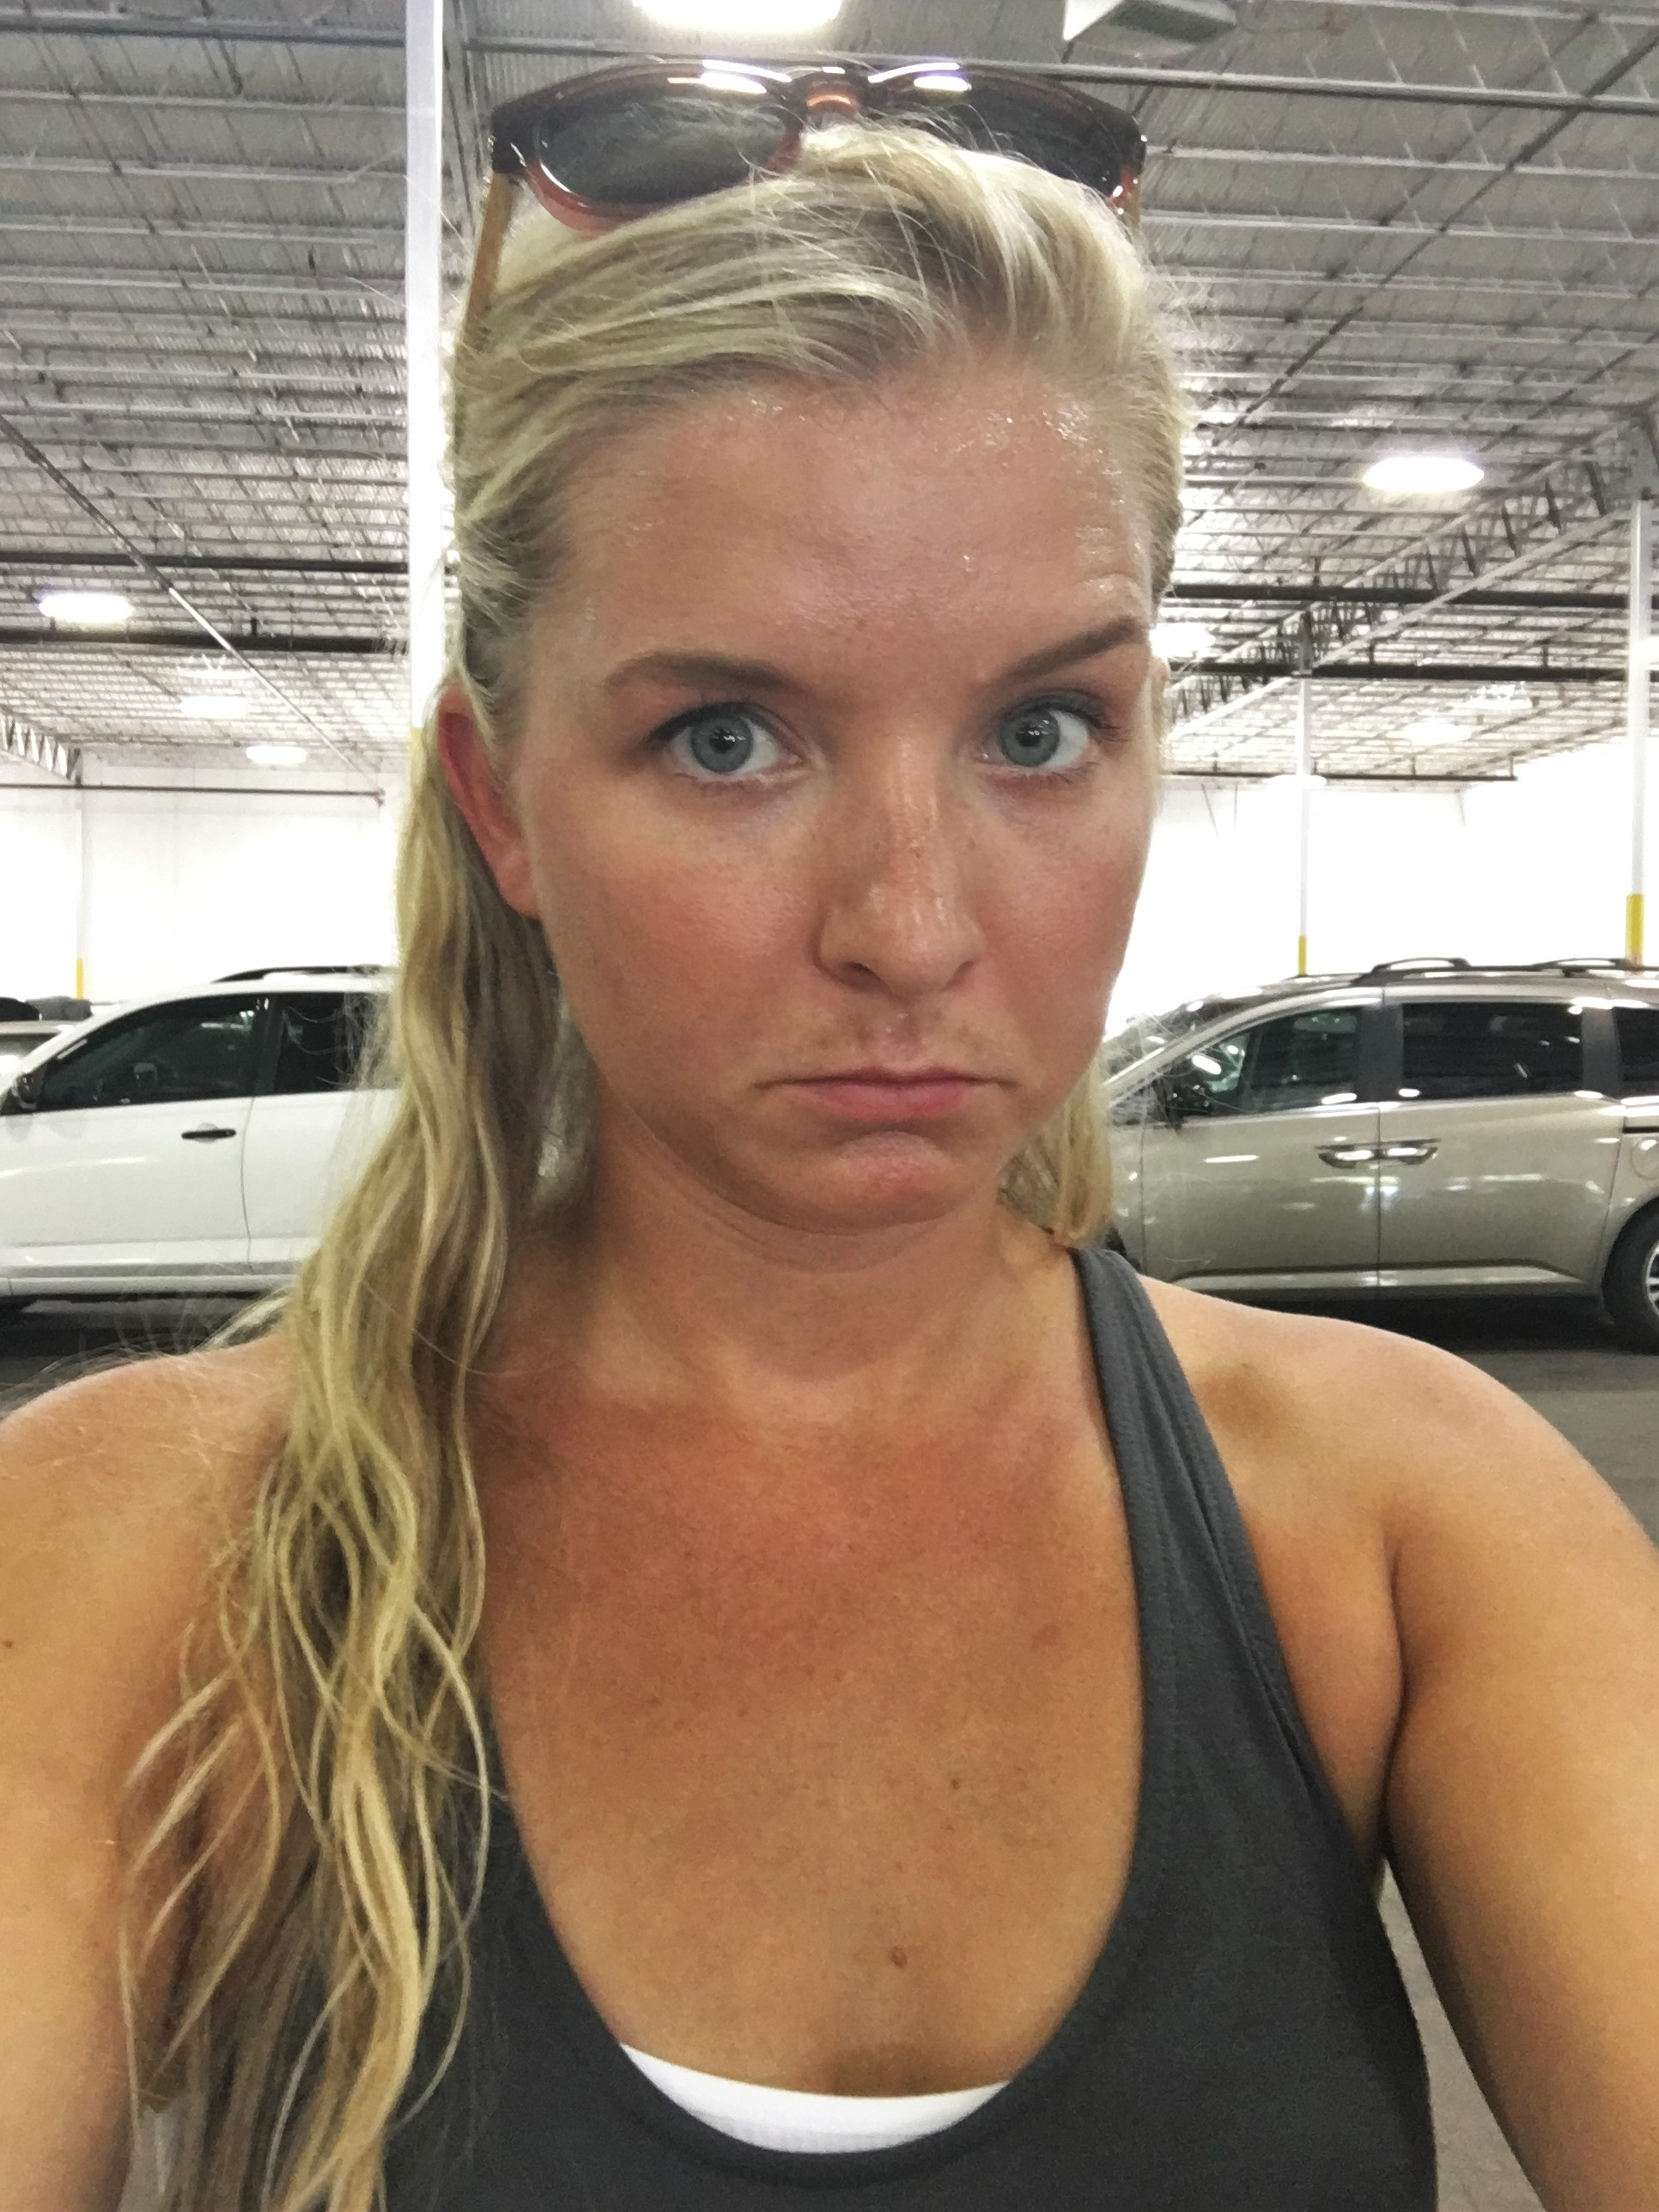 HOT Warehouse... sweating